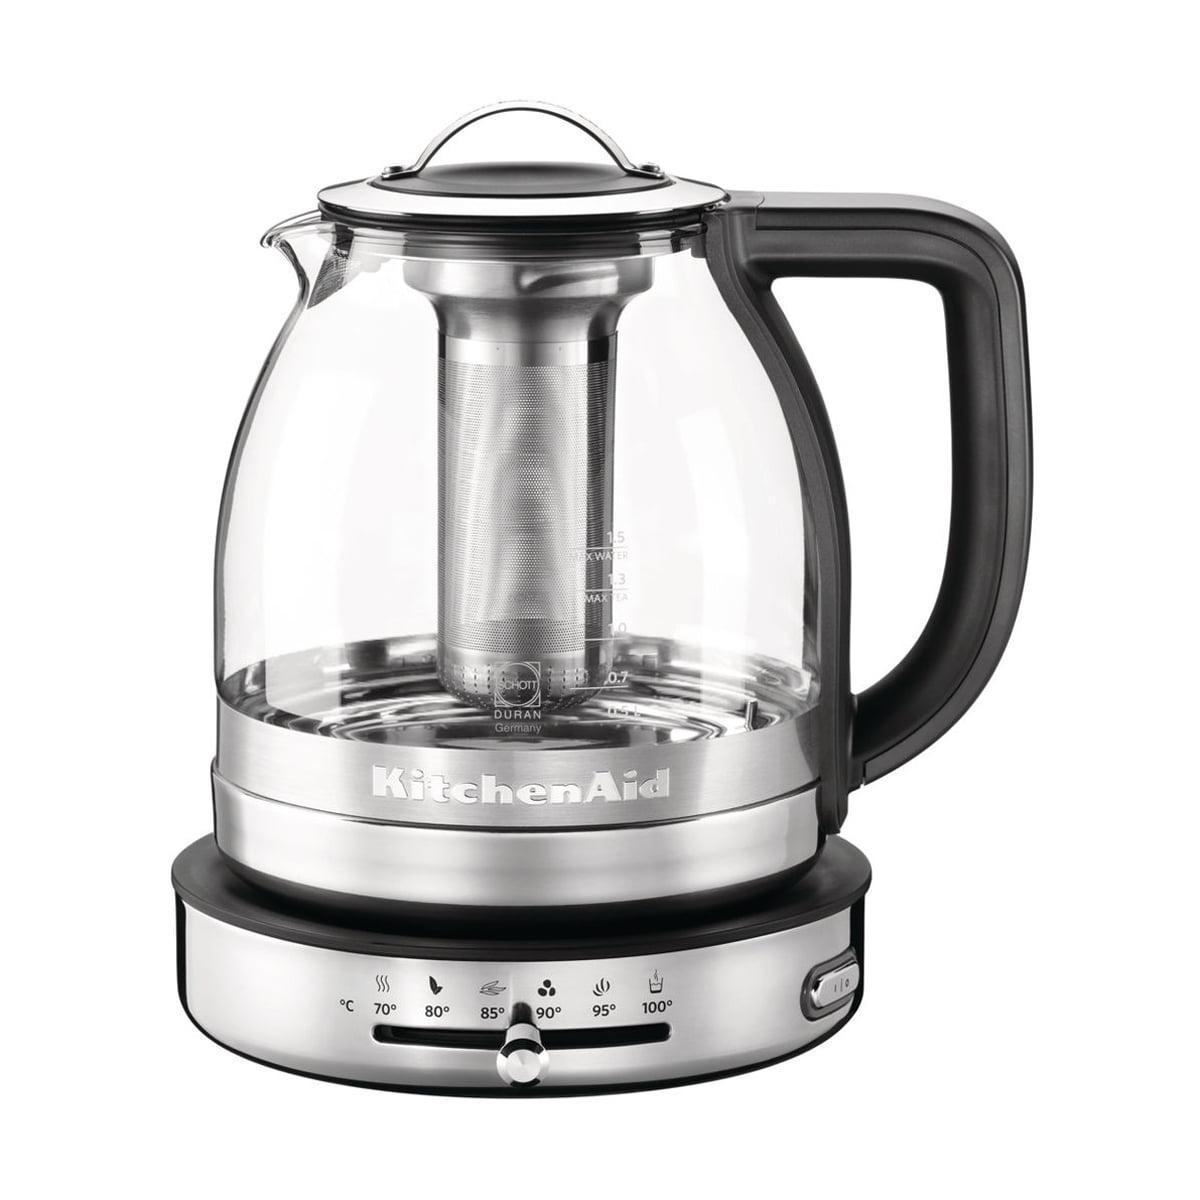 Black Kitchenaid Kettle: Artisan Tea Kettle By KitchenAid